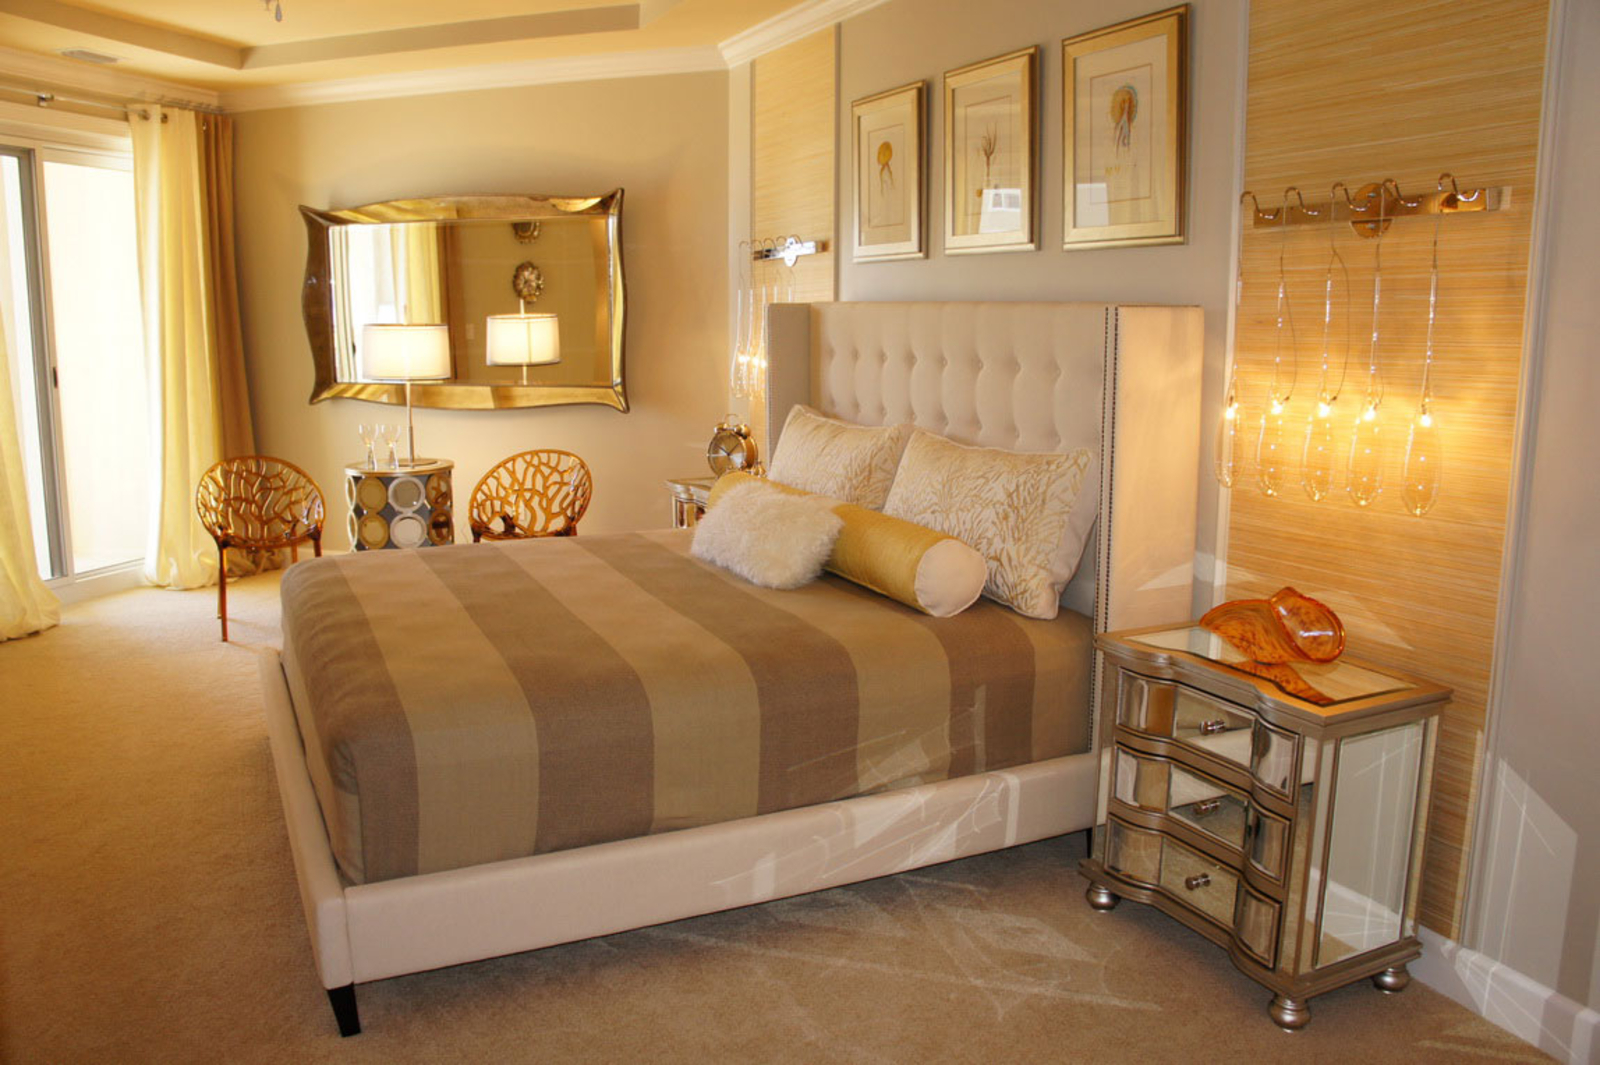 50 best bedroom design ideas for 2017